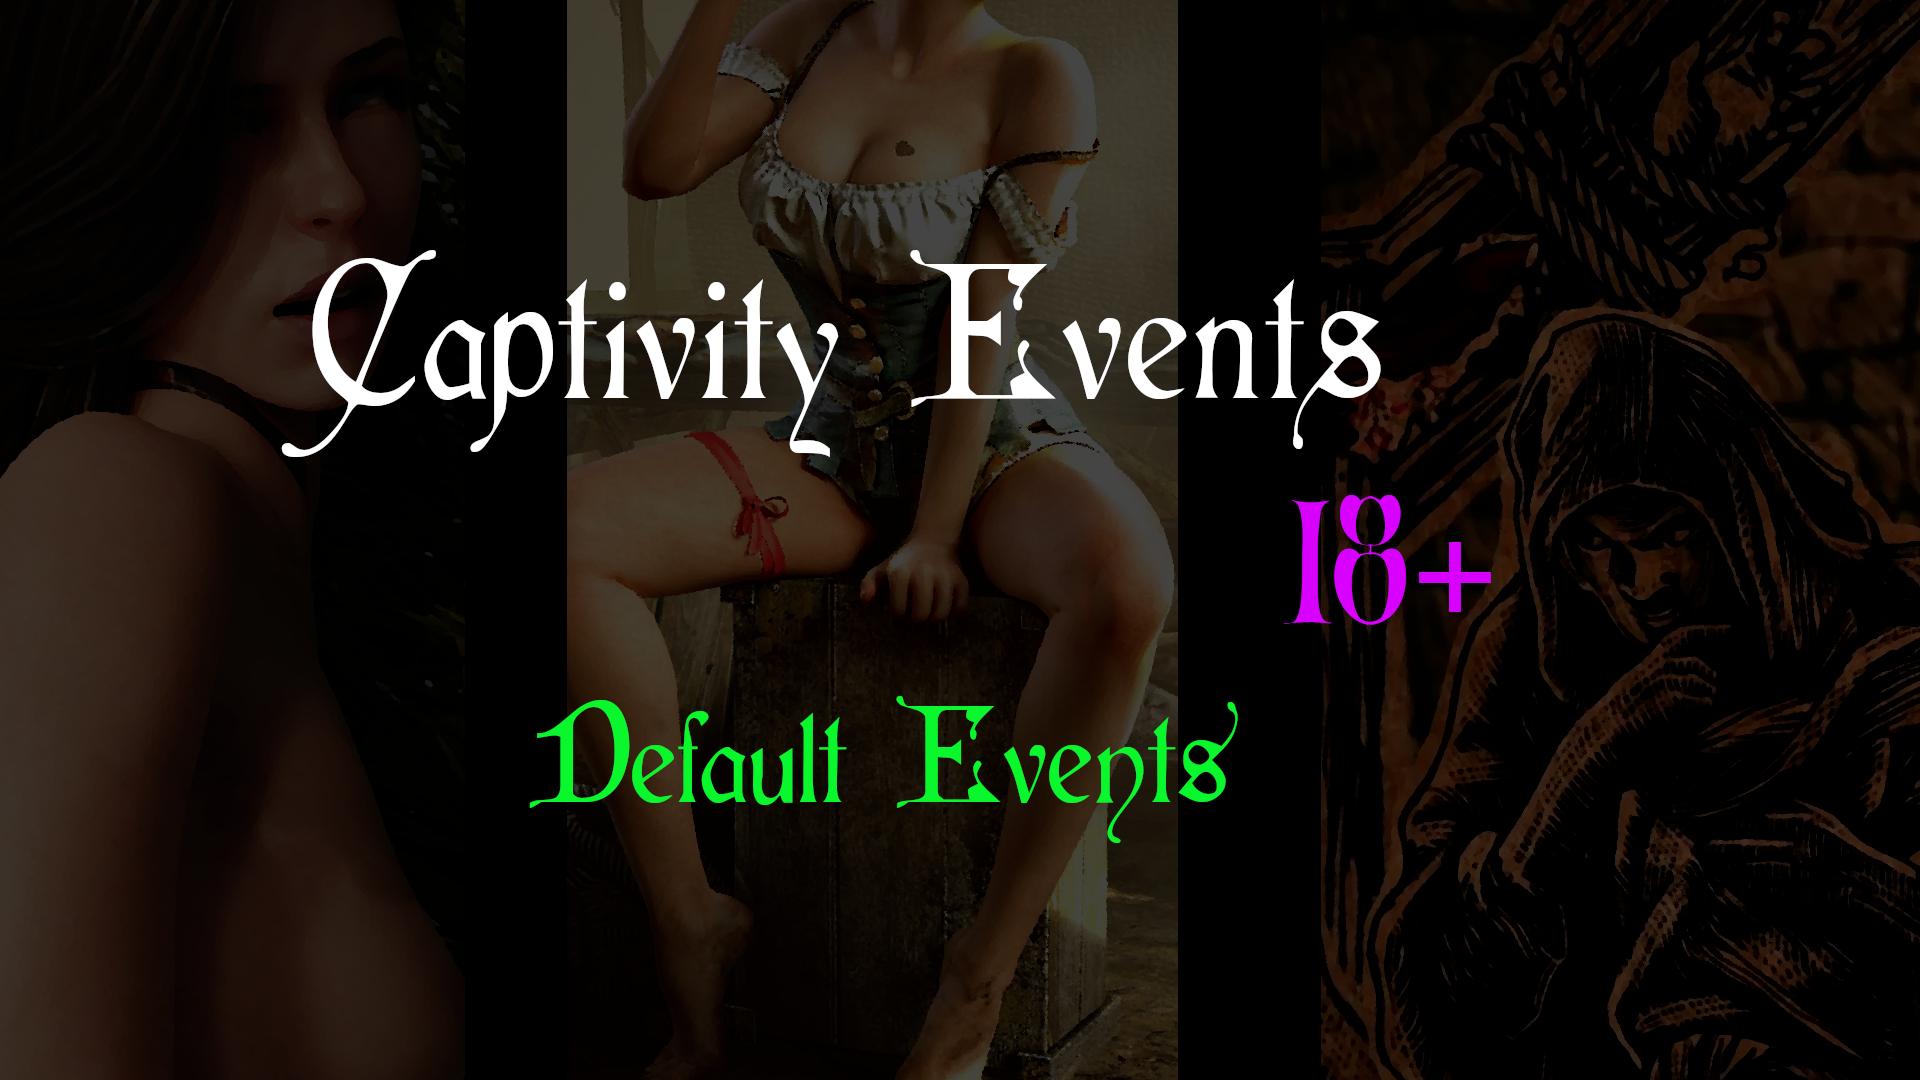 Captivity Events 1.5.0.1013 (мод + русификатор)